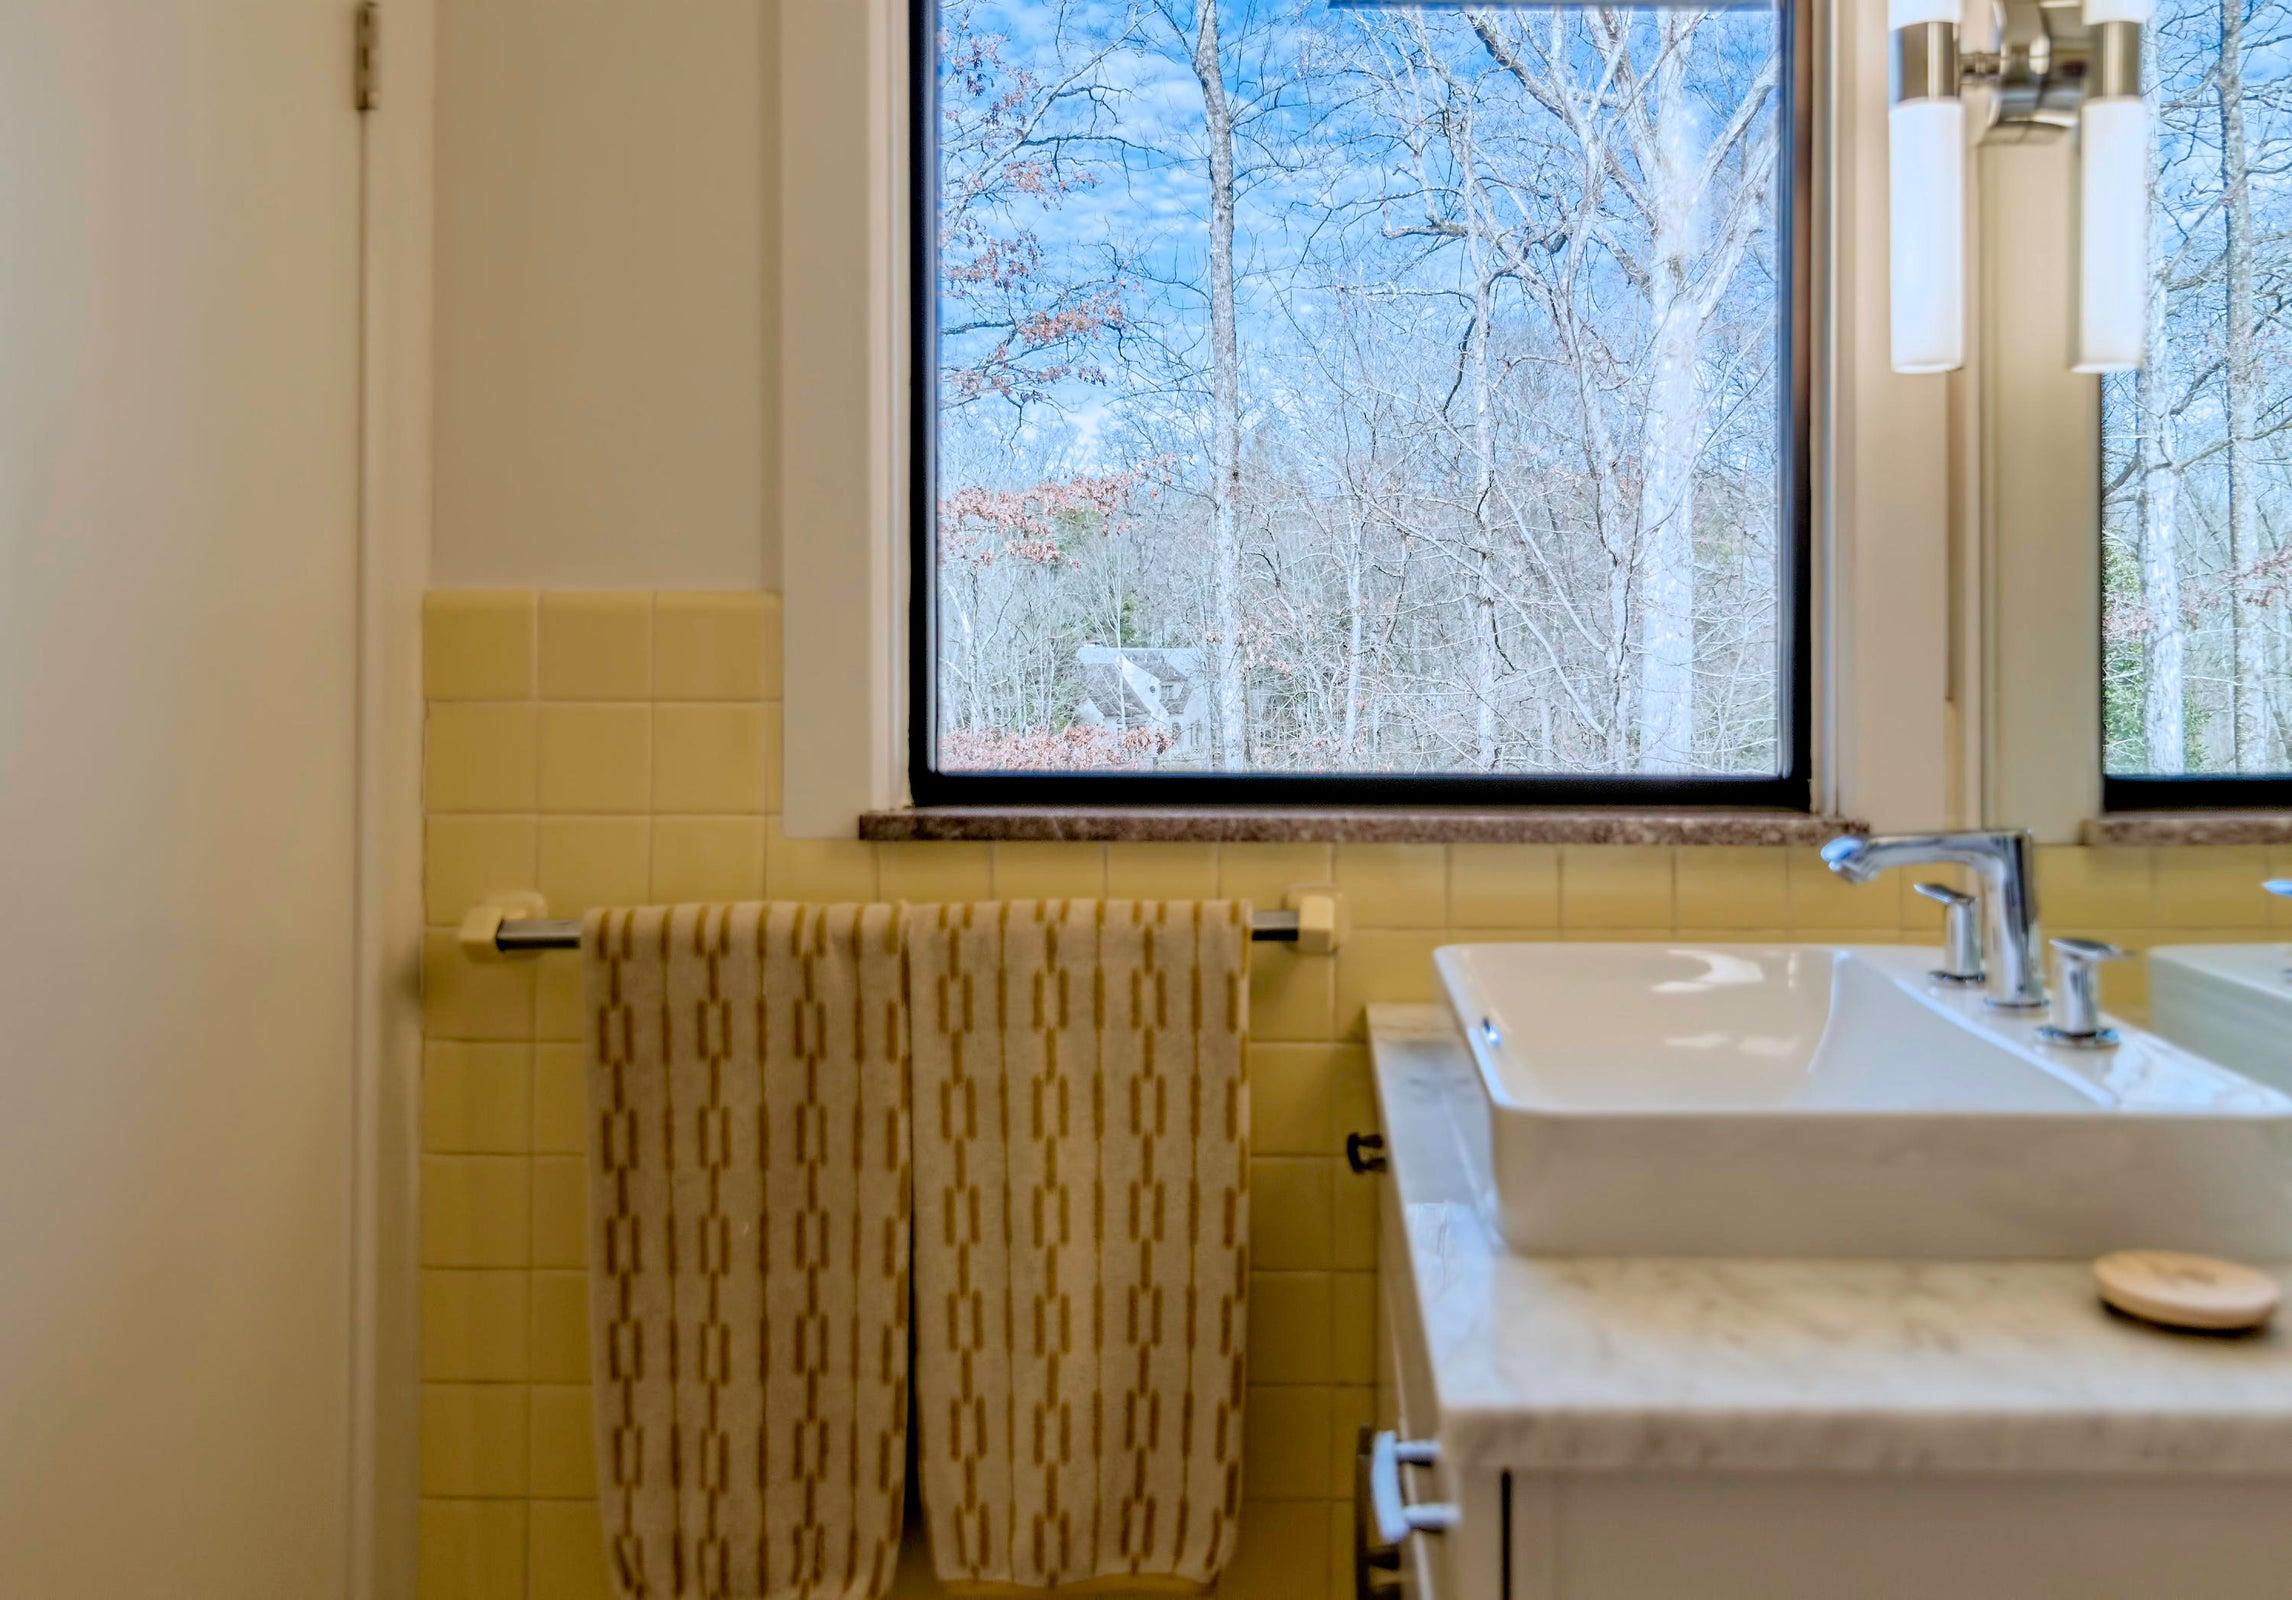 DSC_2322 - Bathroom 2